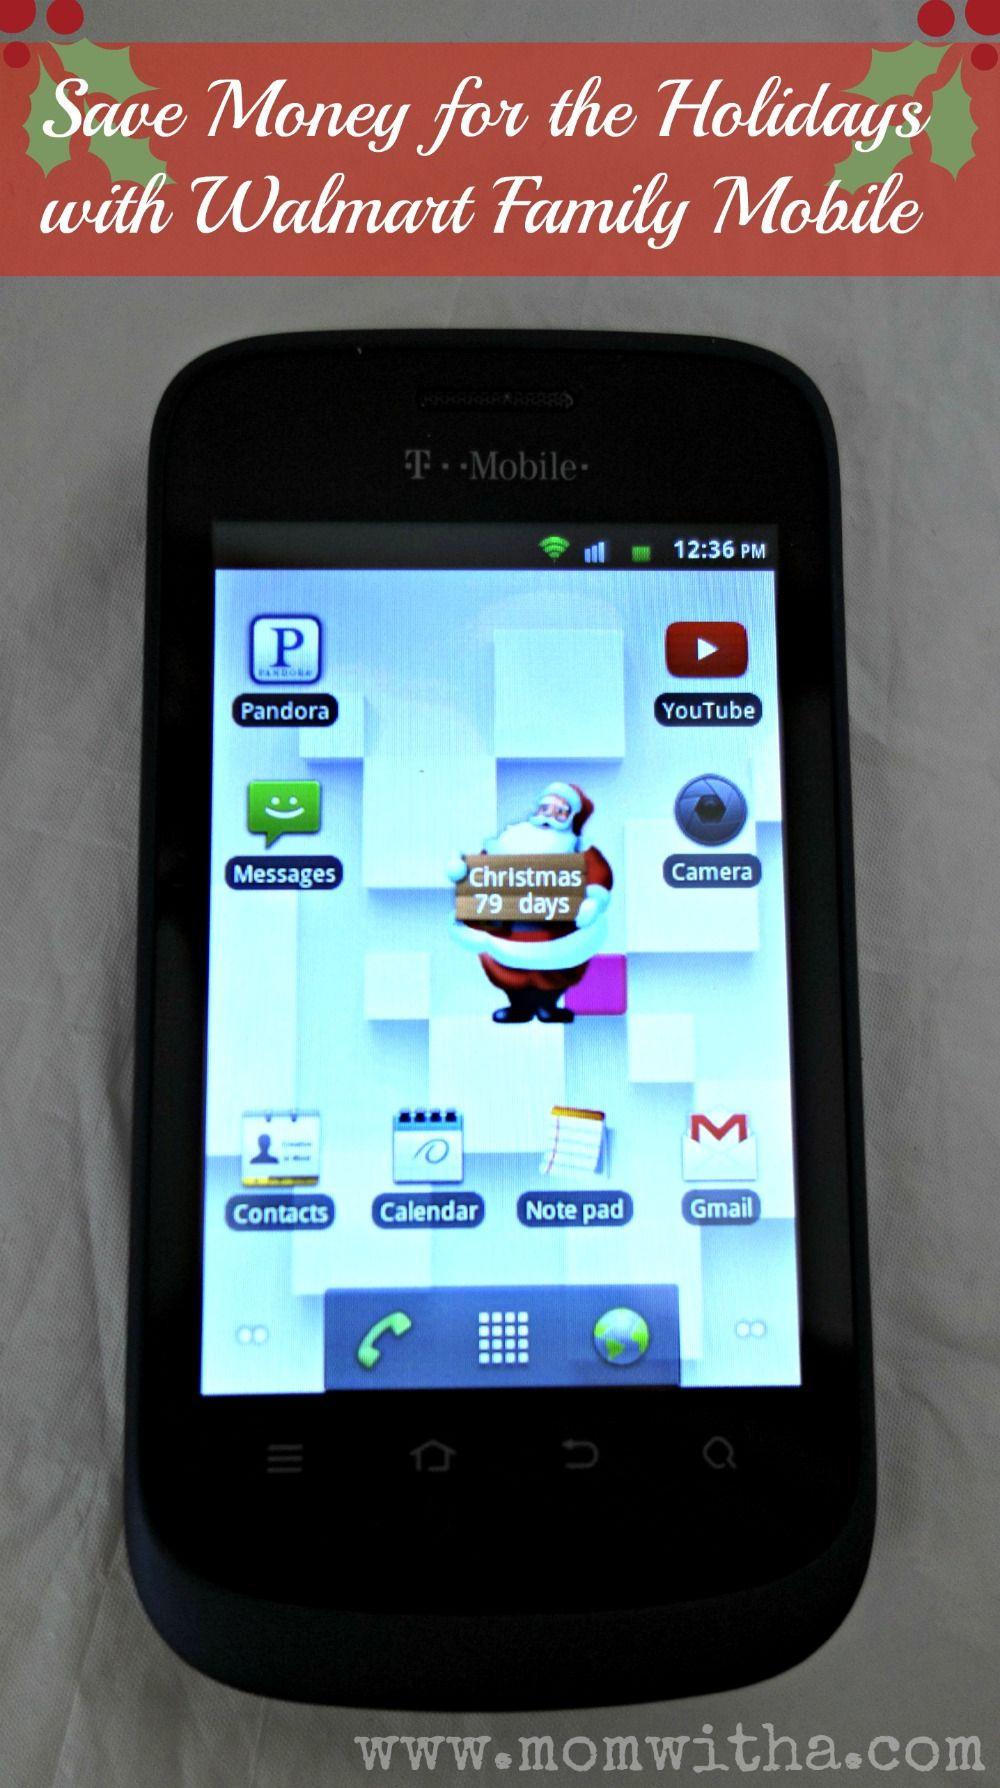 Save Money with Walmart Family Mobile FamilyMobileSaves